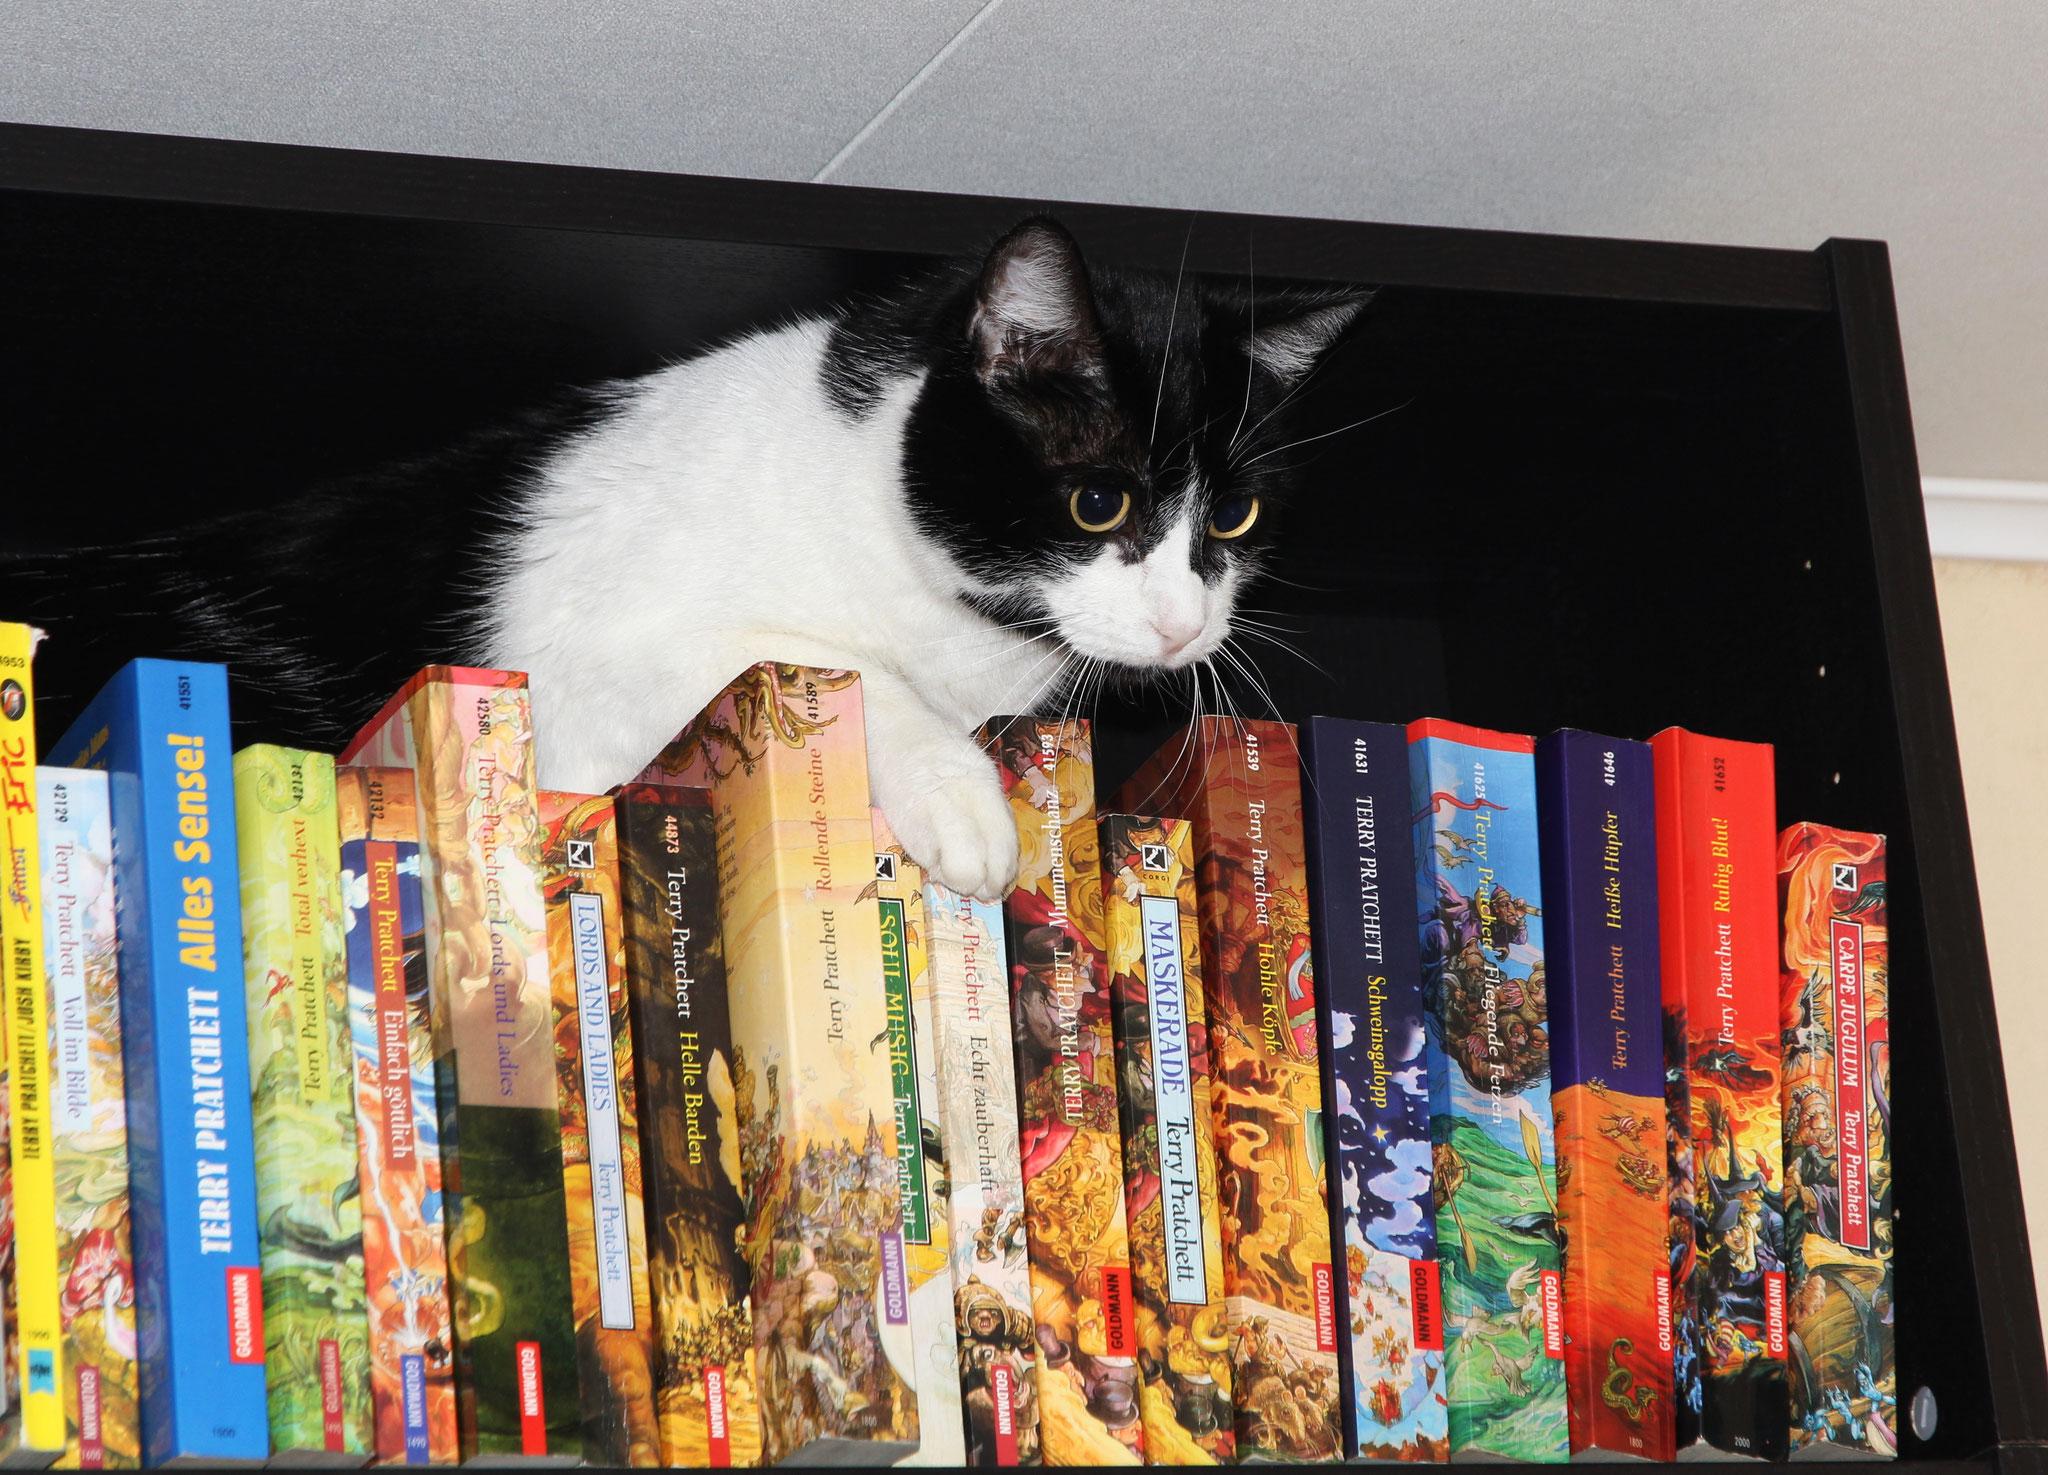 Eure piepsige Hoheit hält im Bücherregal Hof.